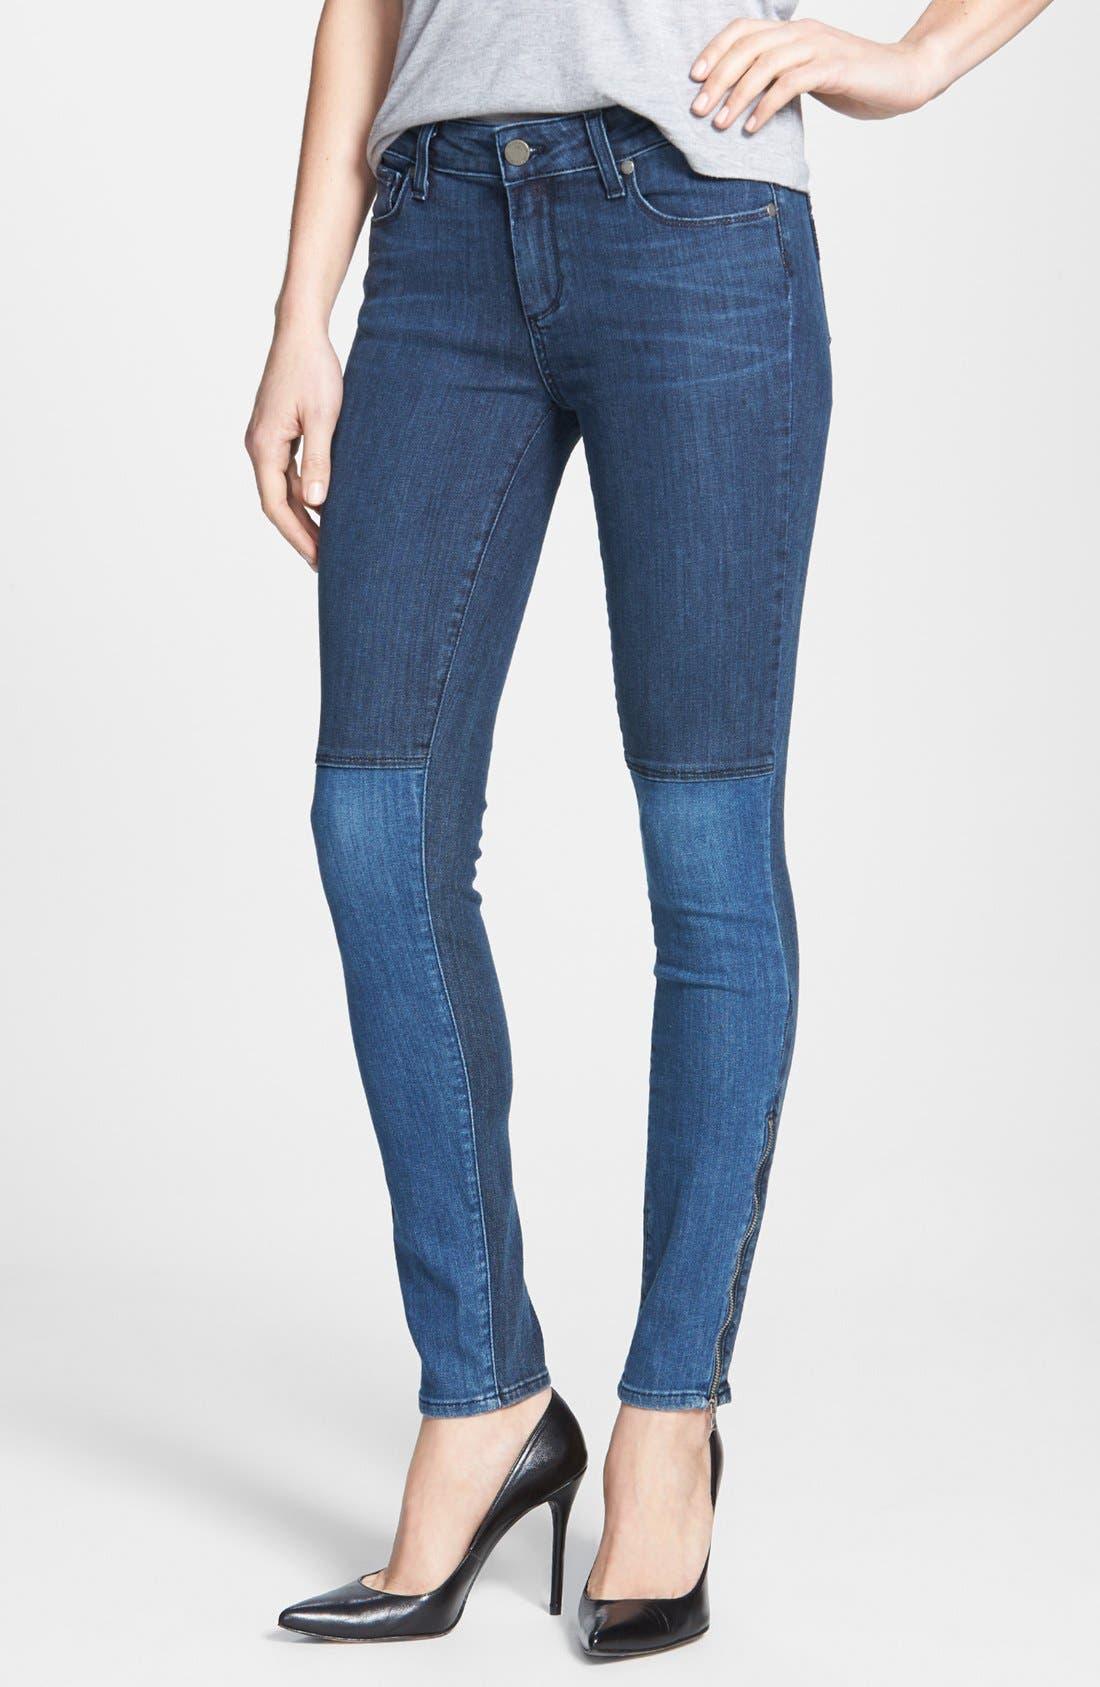 Main Image - Paige Denim 'Cara' Patchwork Ultra Skinny Jeans (Coastal)